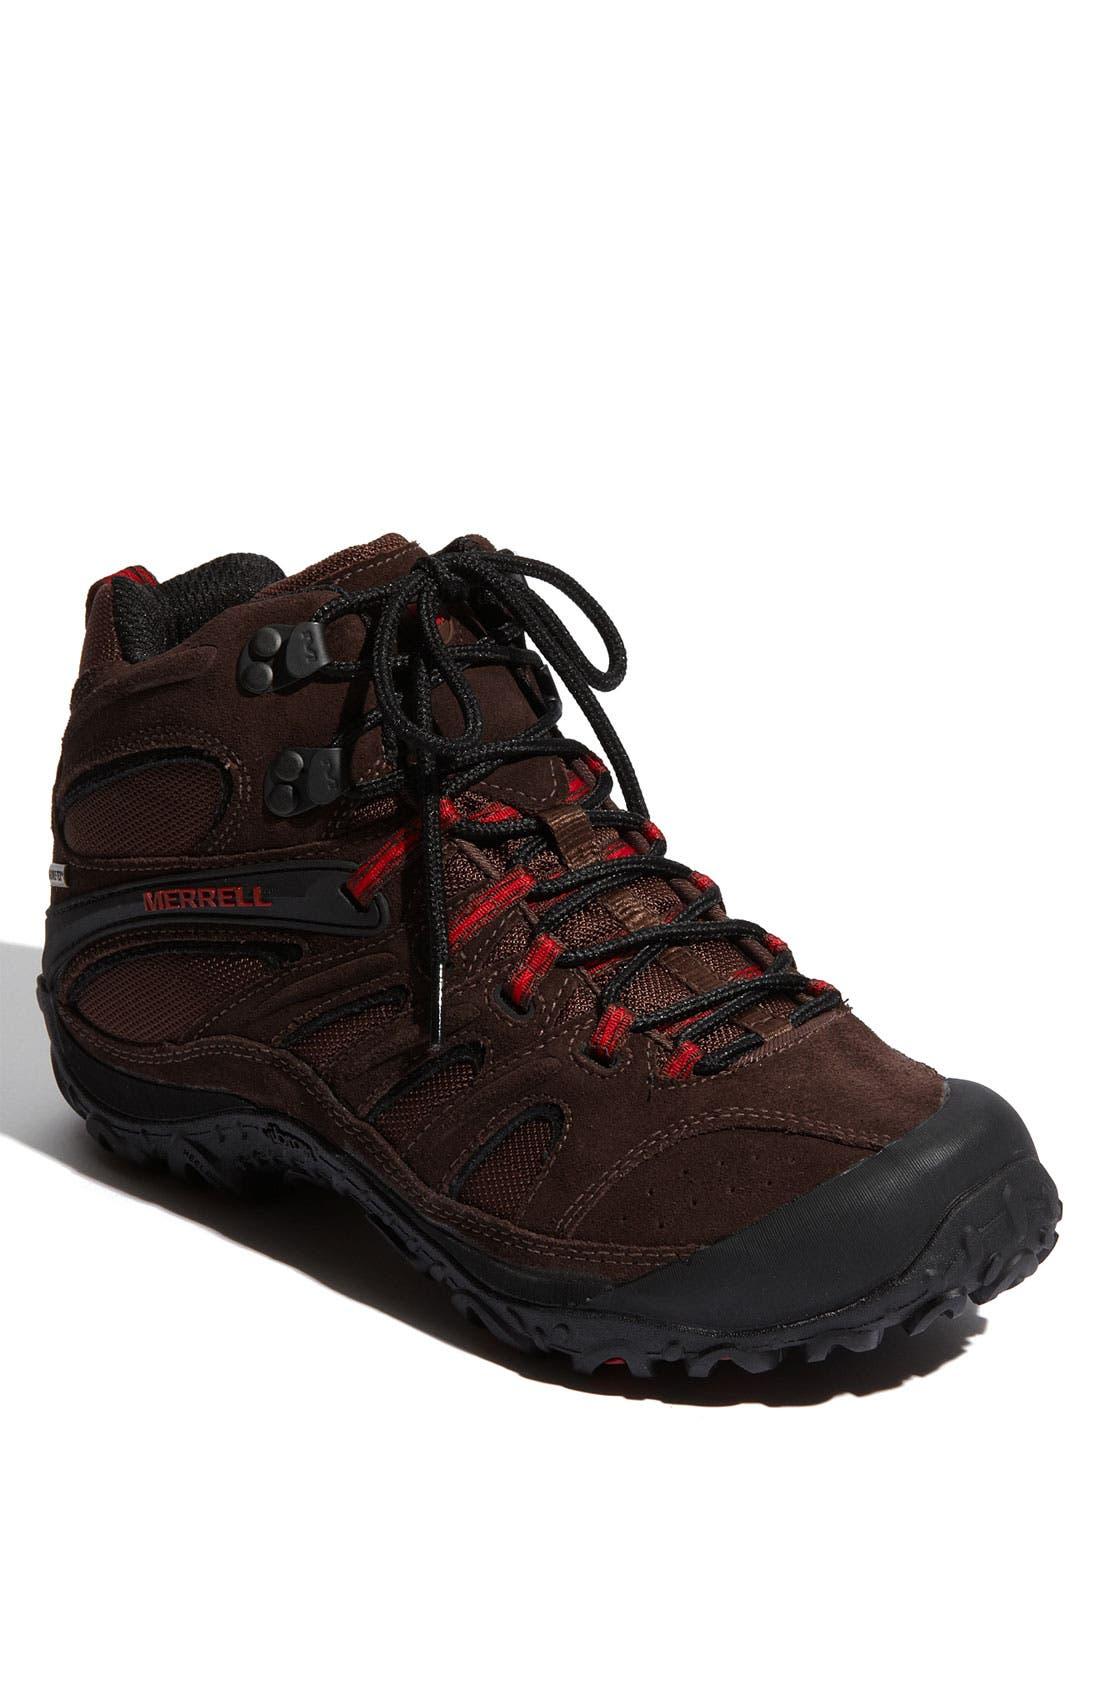 Main Image - Merrell 'Chameleon 4 Mid Ventilator GORE-TEX®' Hiking Boot